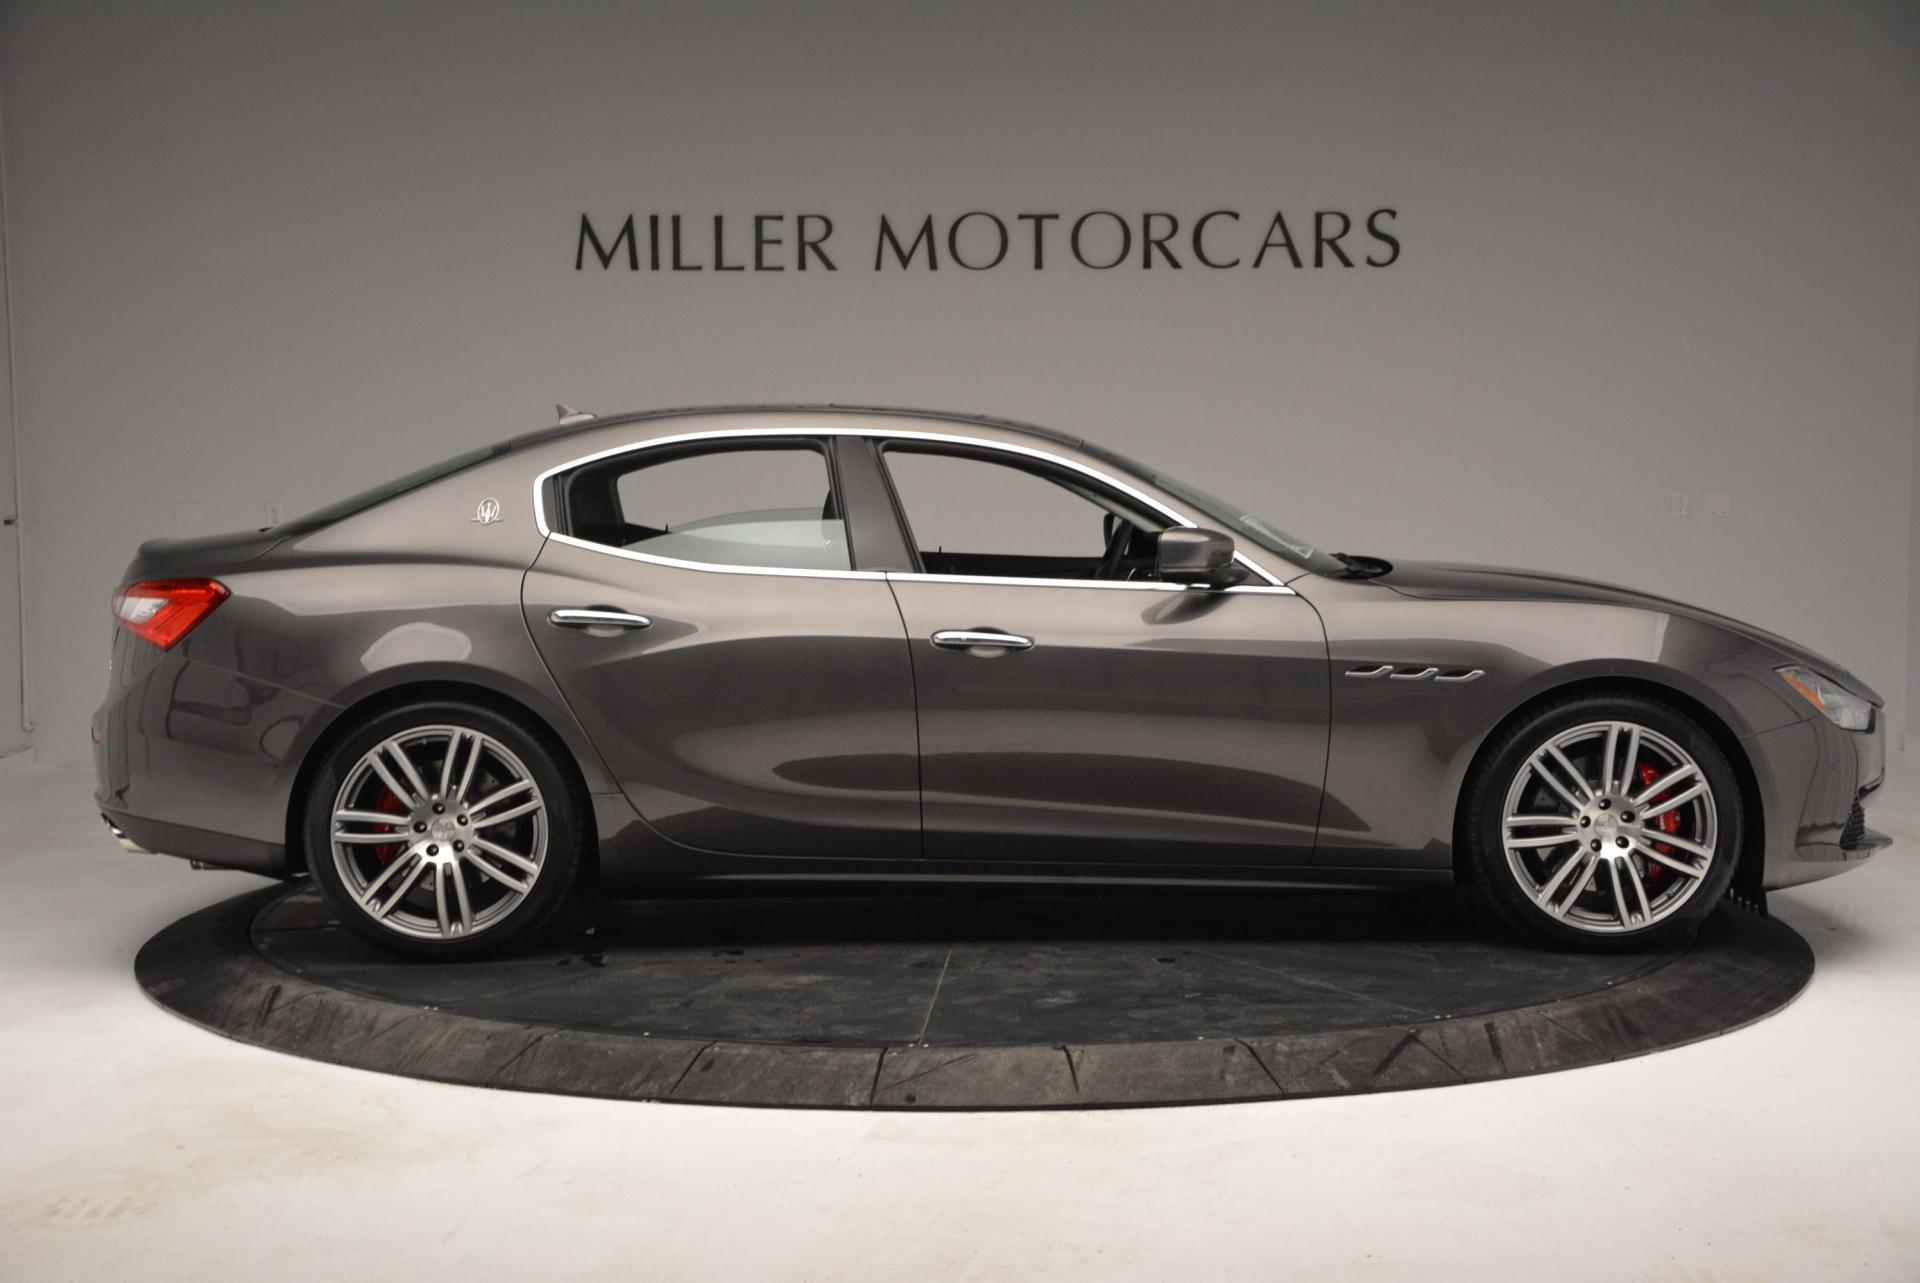 New 2016 Maserati Ghibli S Q4 For Sale 0 In Greenwich, CT